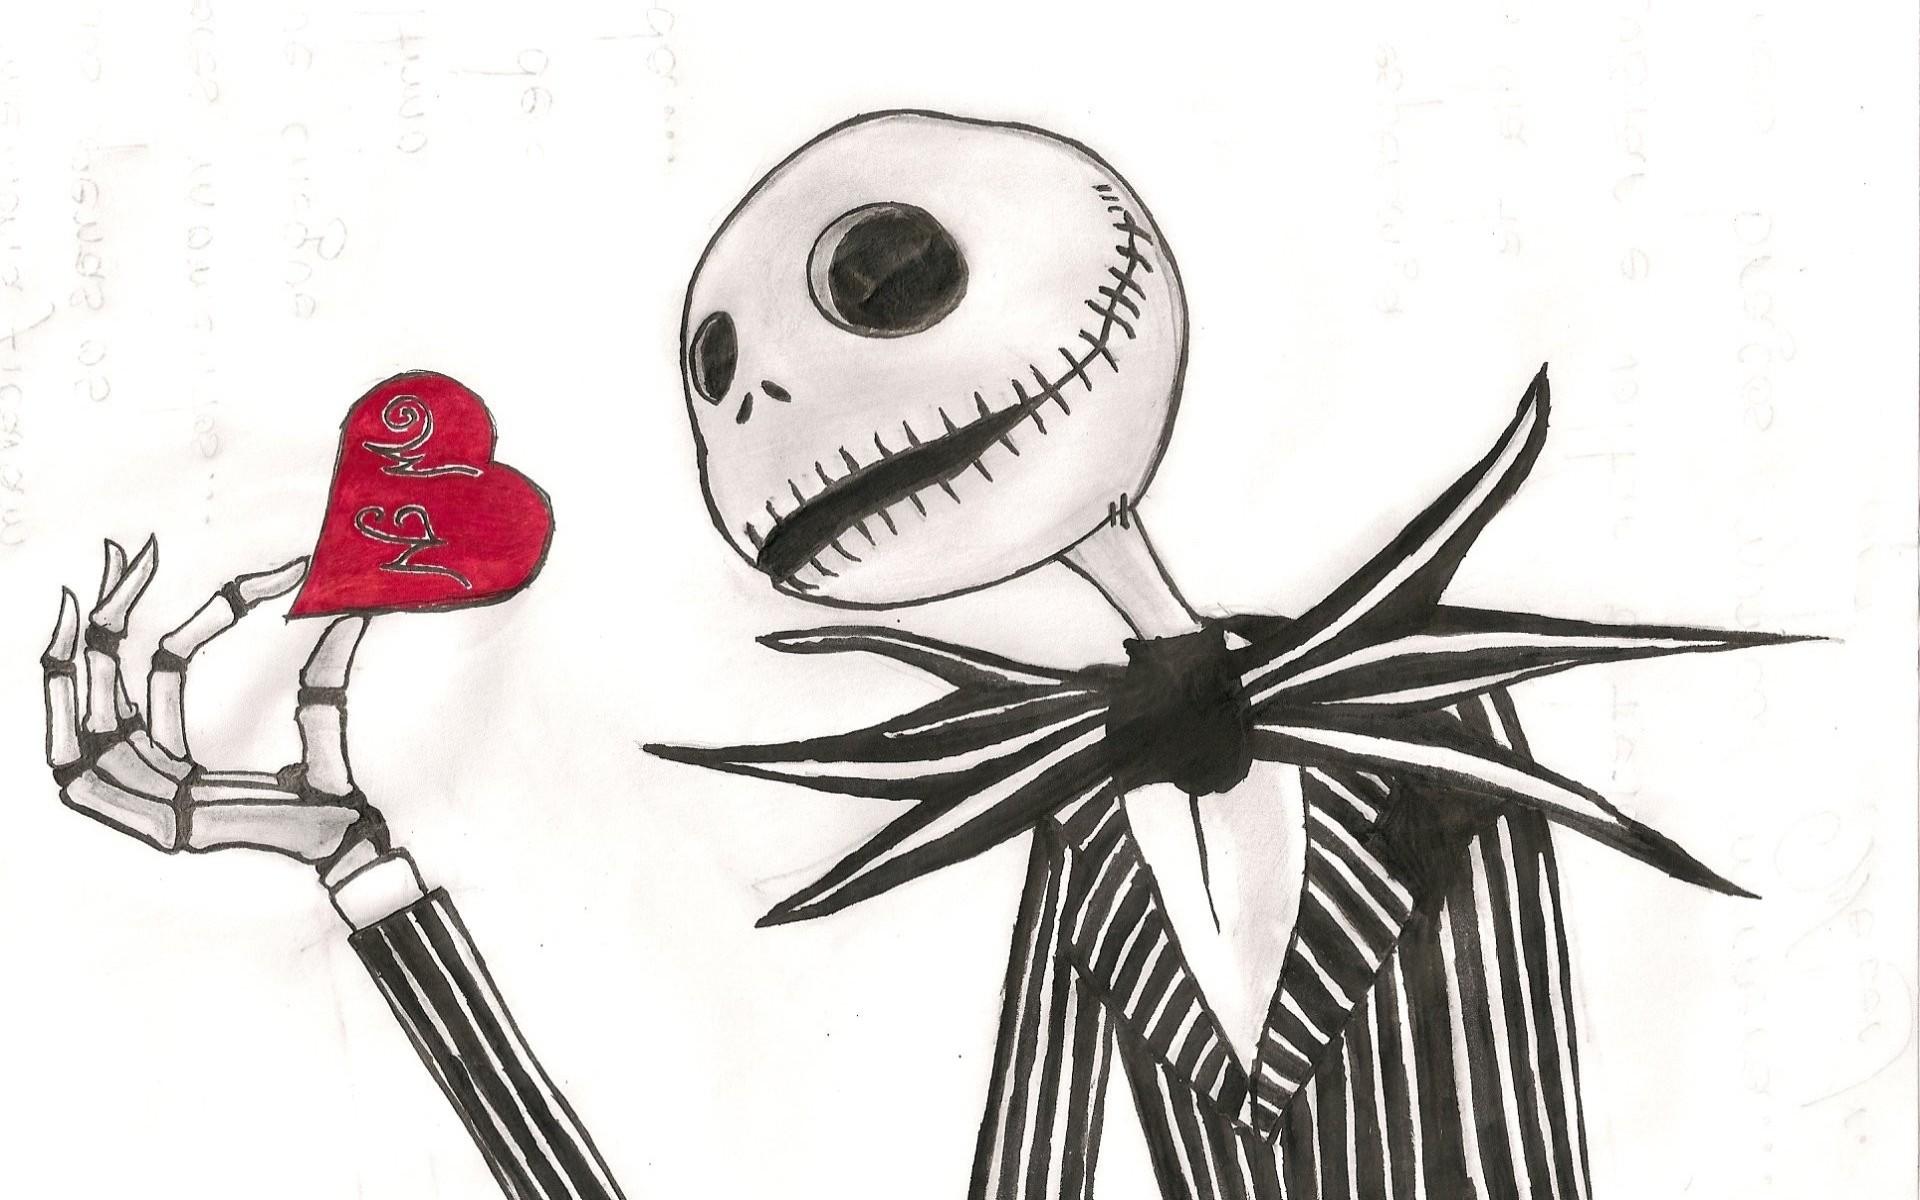 Jack skellington the nightmare before christmas dark skull love romance  mood art wallpaper | | 28354 | WallpaperUP